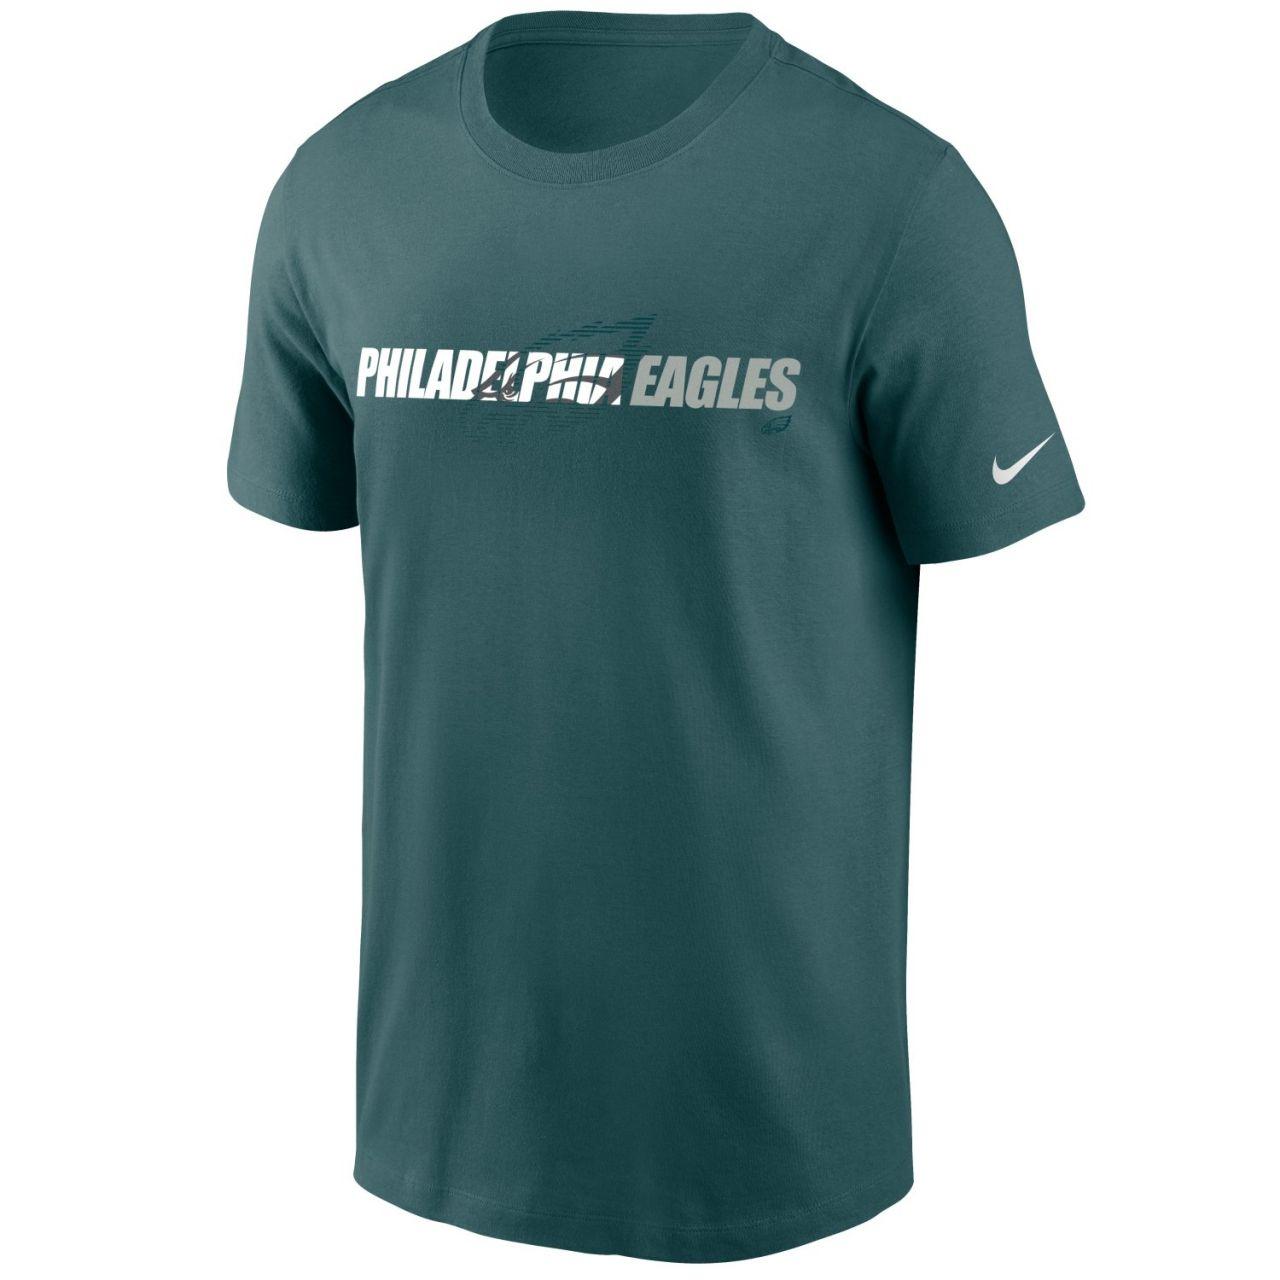 amfoo - Nike NFL Tonal Essential Shirt - Philadelphia Eagles